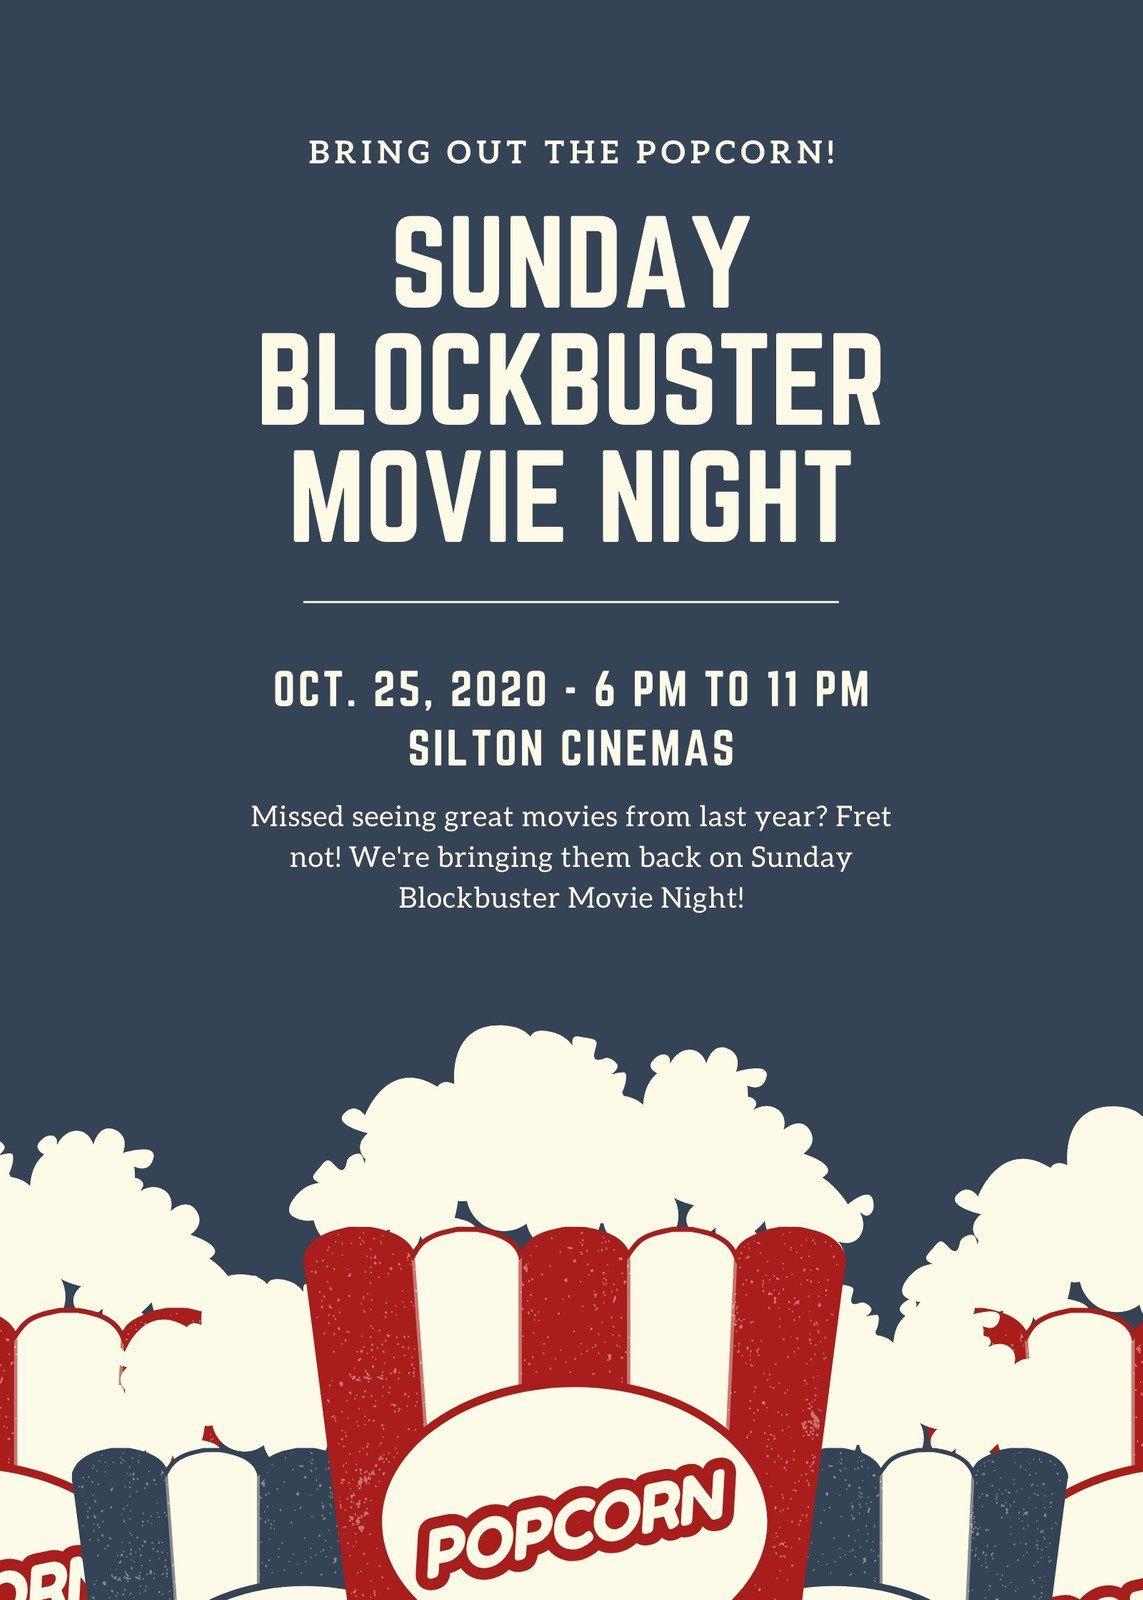 003 Phenomenal Movie Night Flyer Template High Def  Editable Psd FreeFull